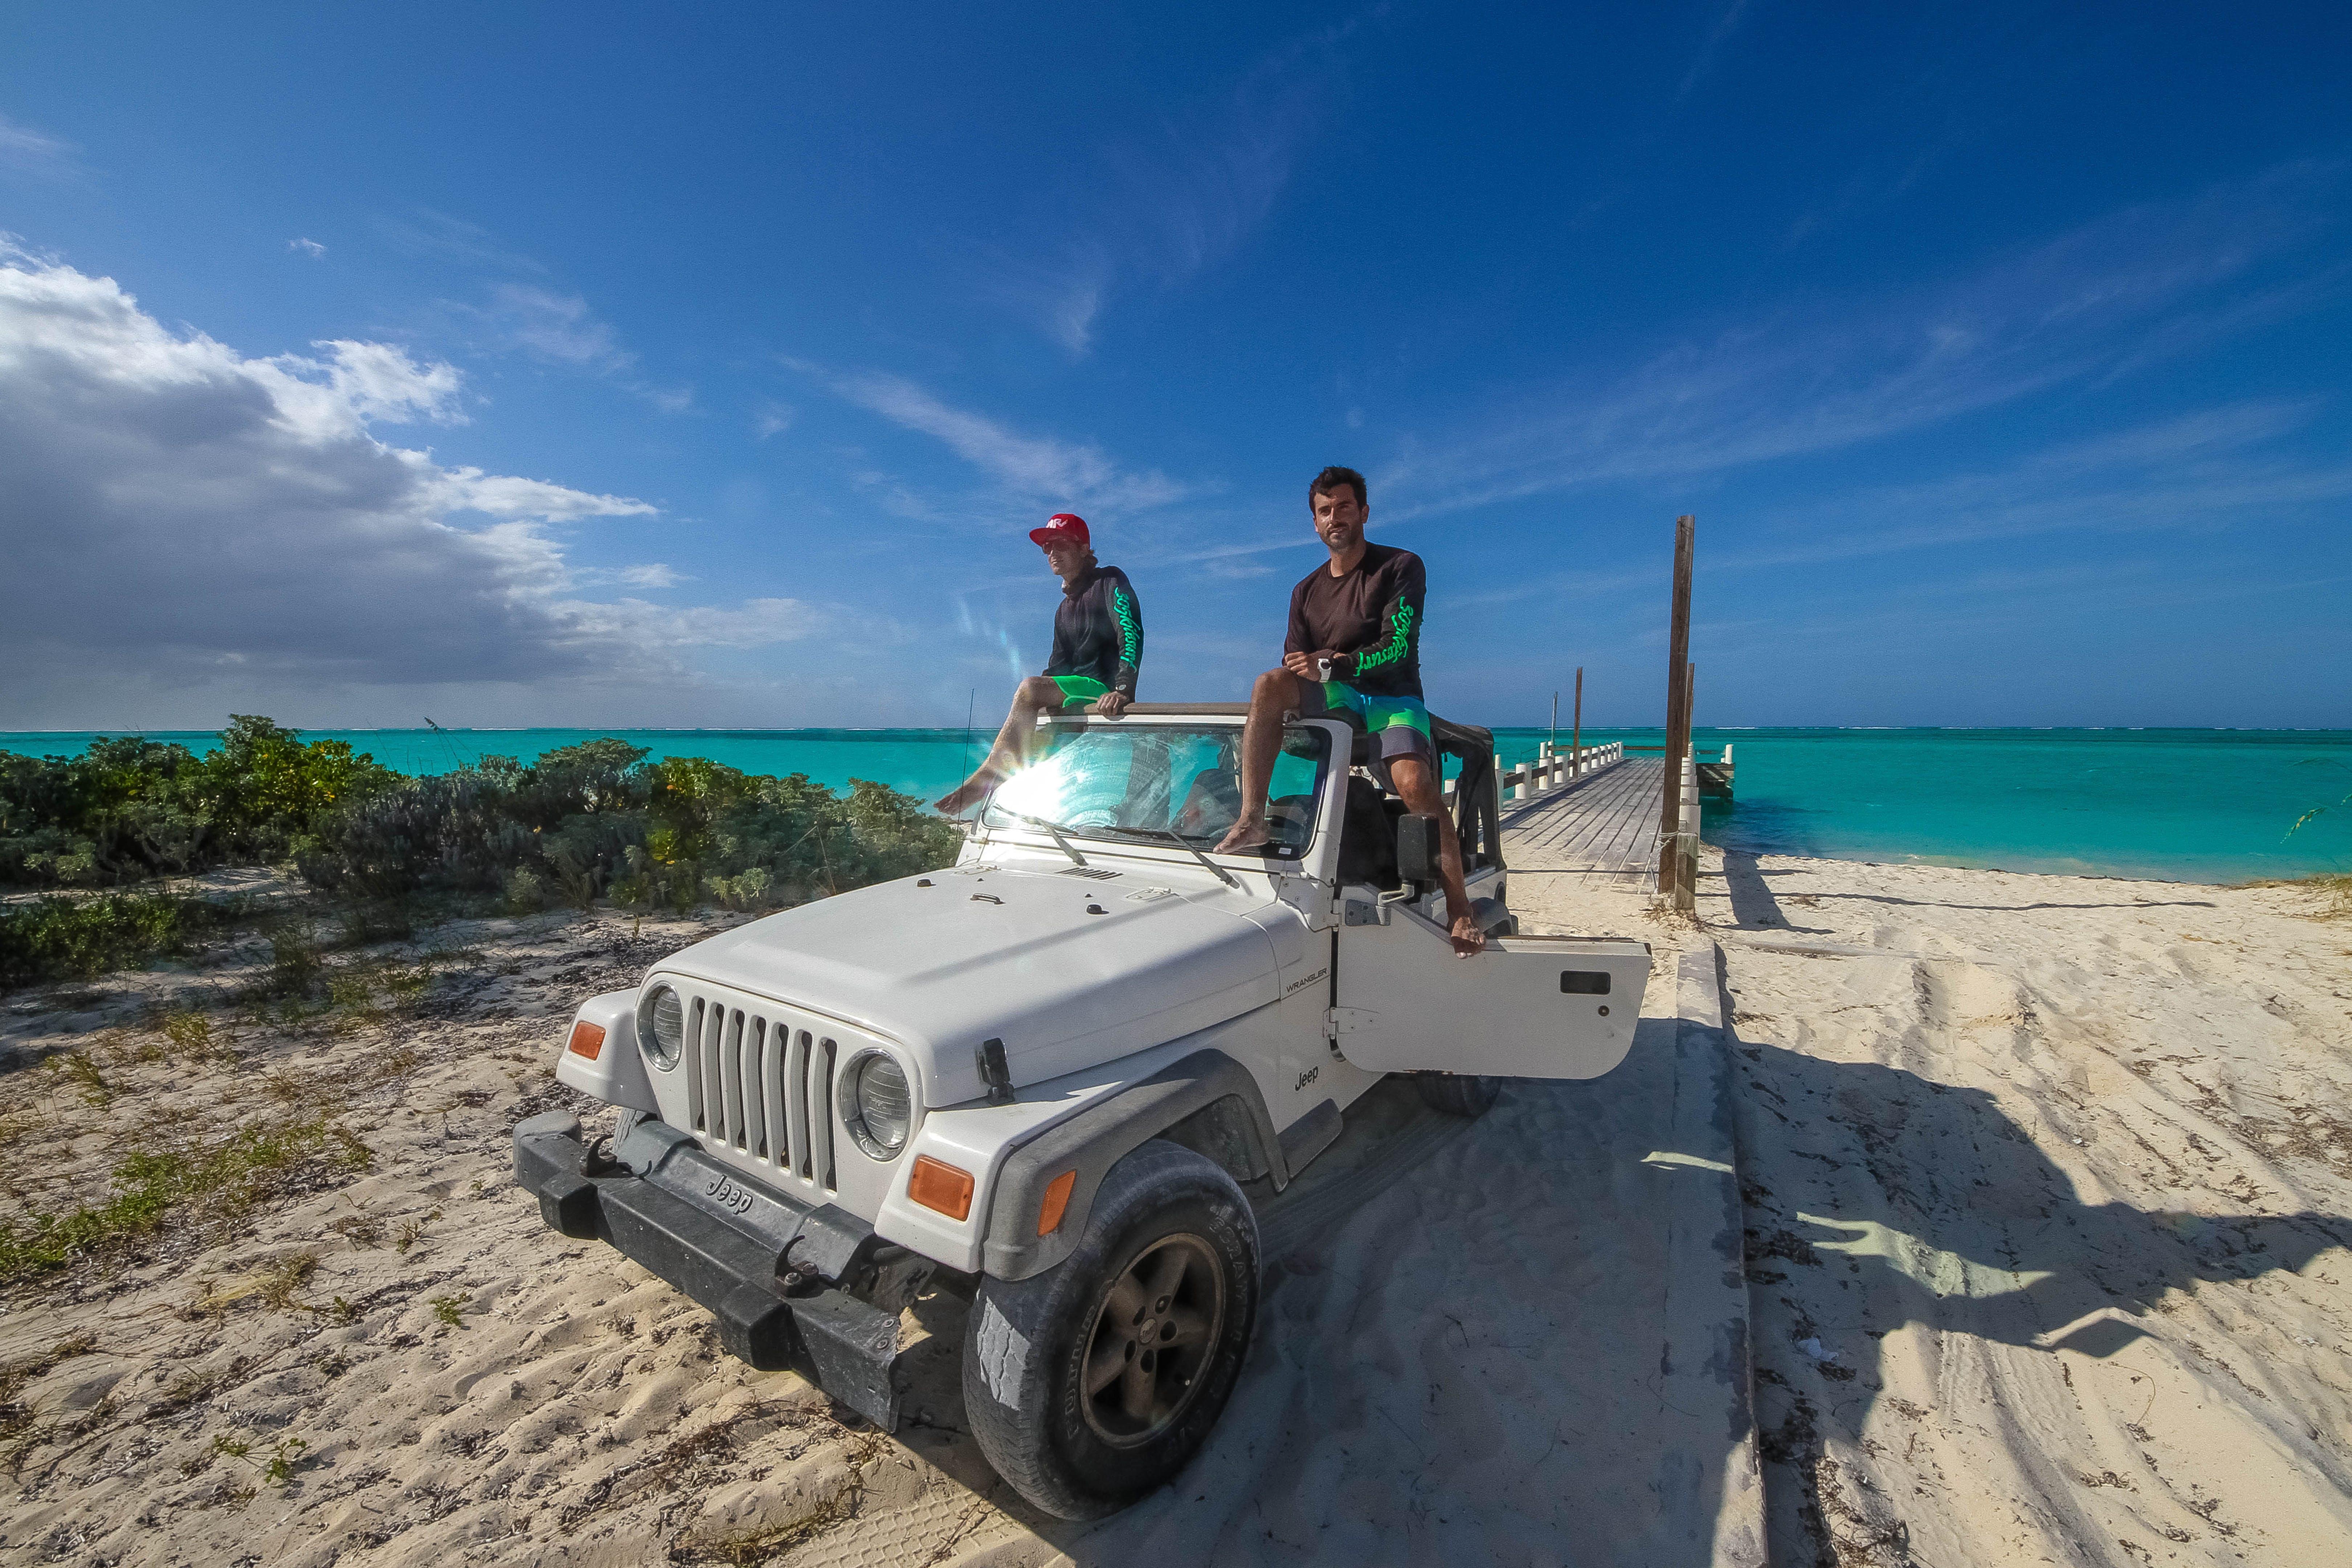 Two Men On White Jeep Wrangler Near Body Of Water